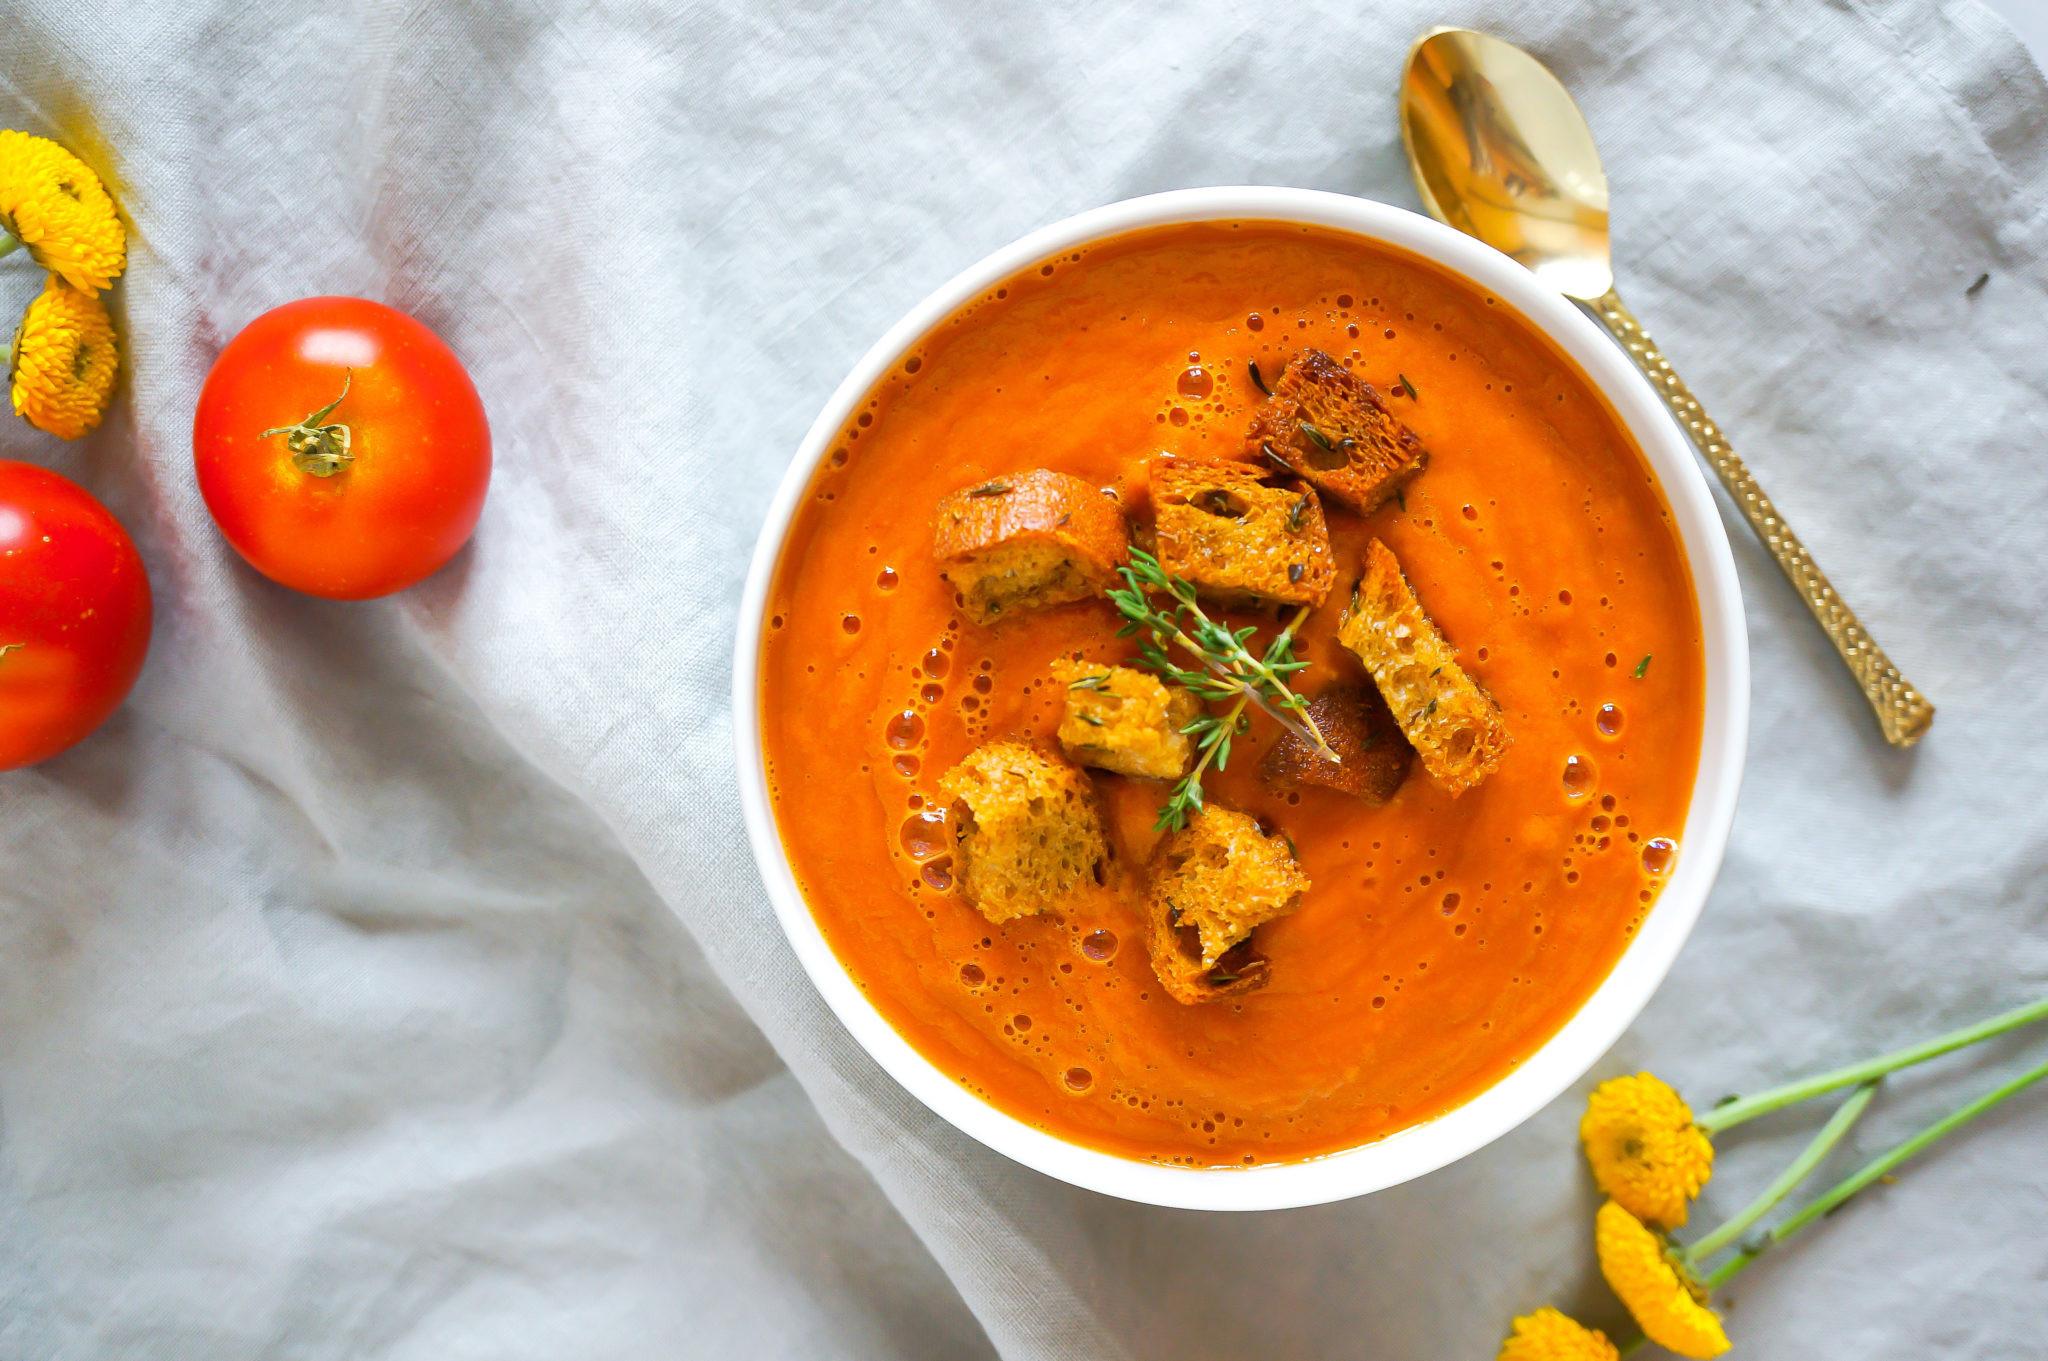 Tomato Soup Recipes  World s Best Tomato Soup Recipe Gluten Free Vegan Paleo